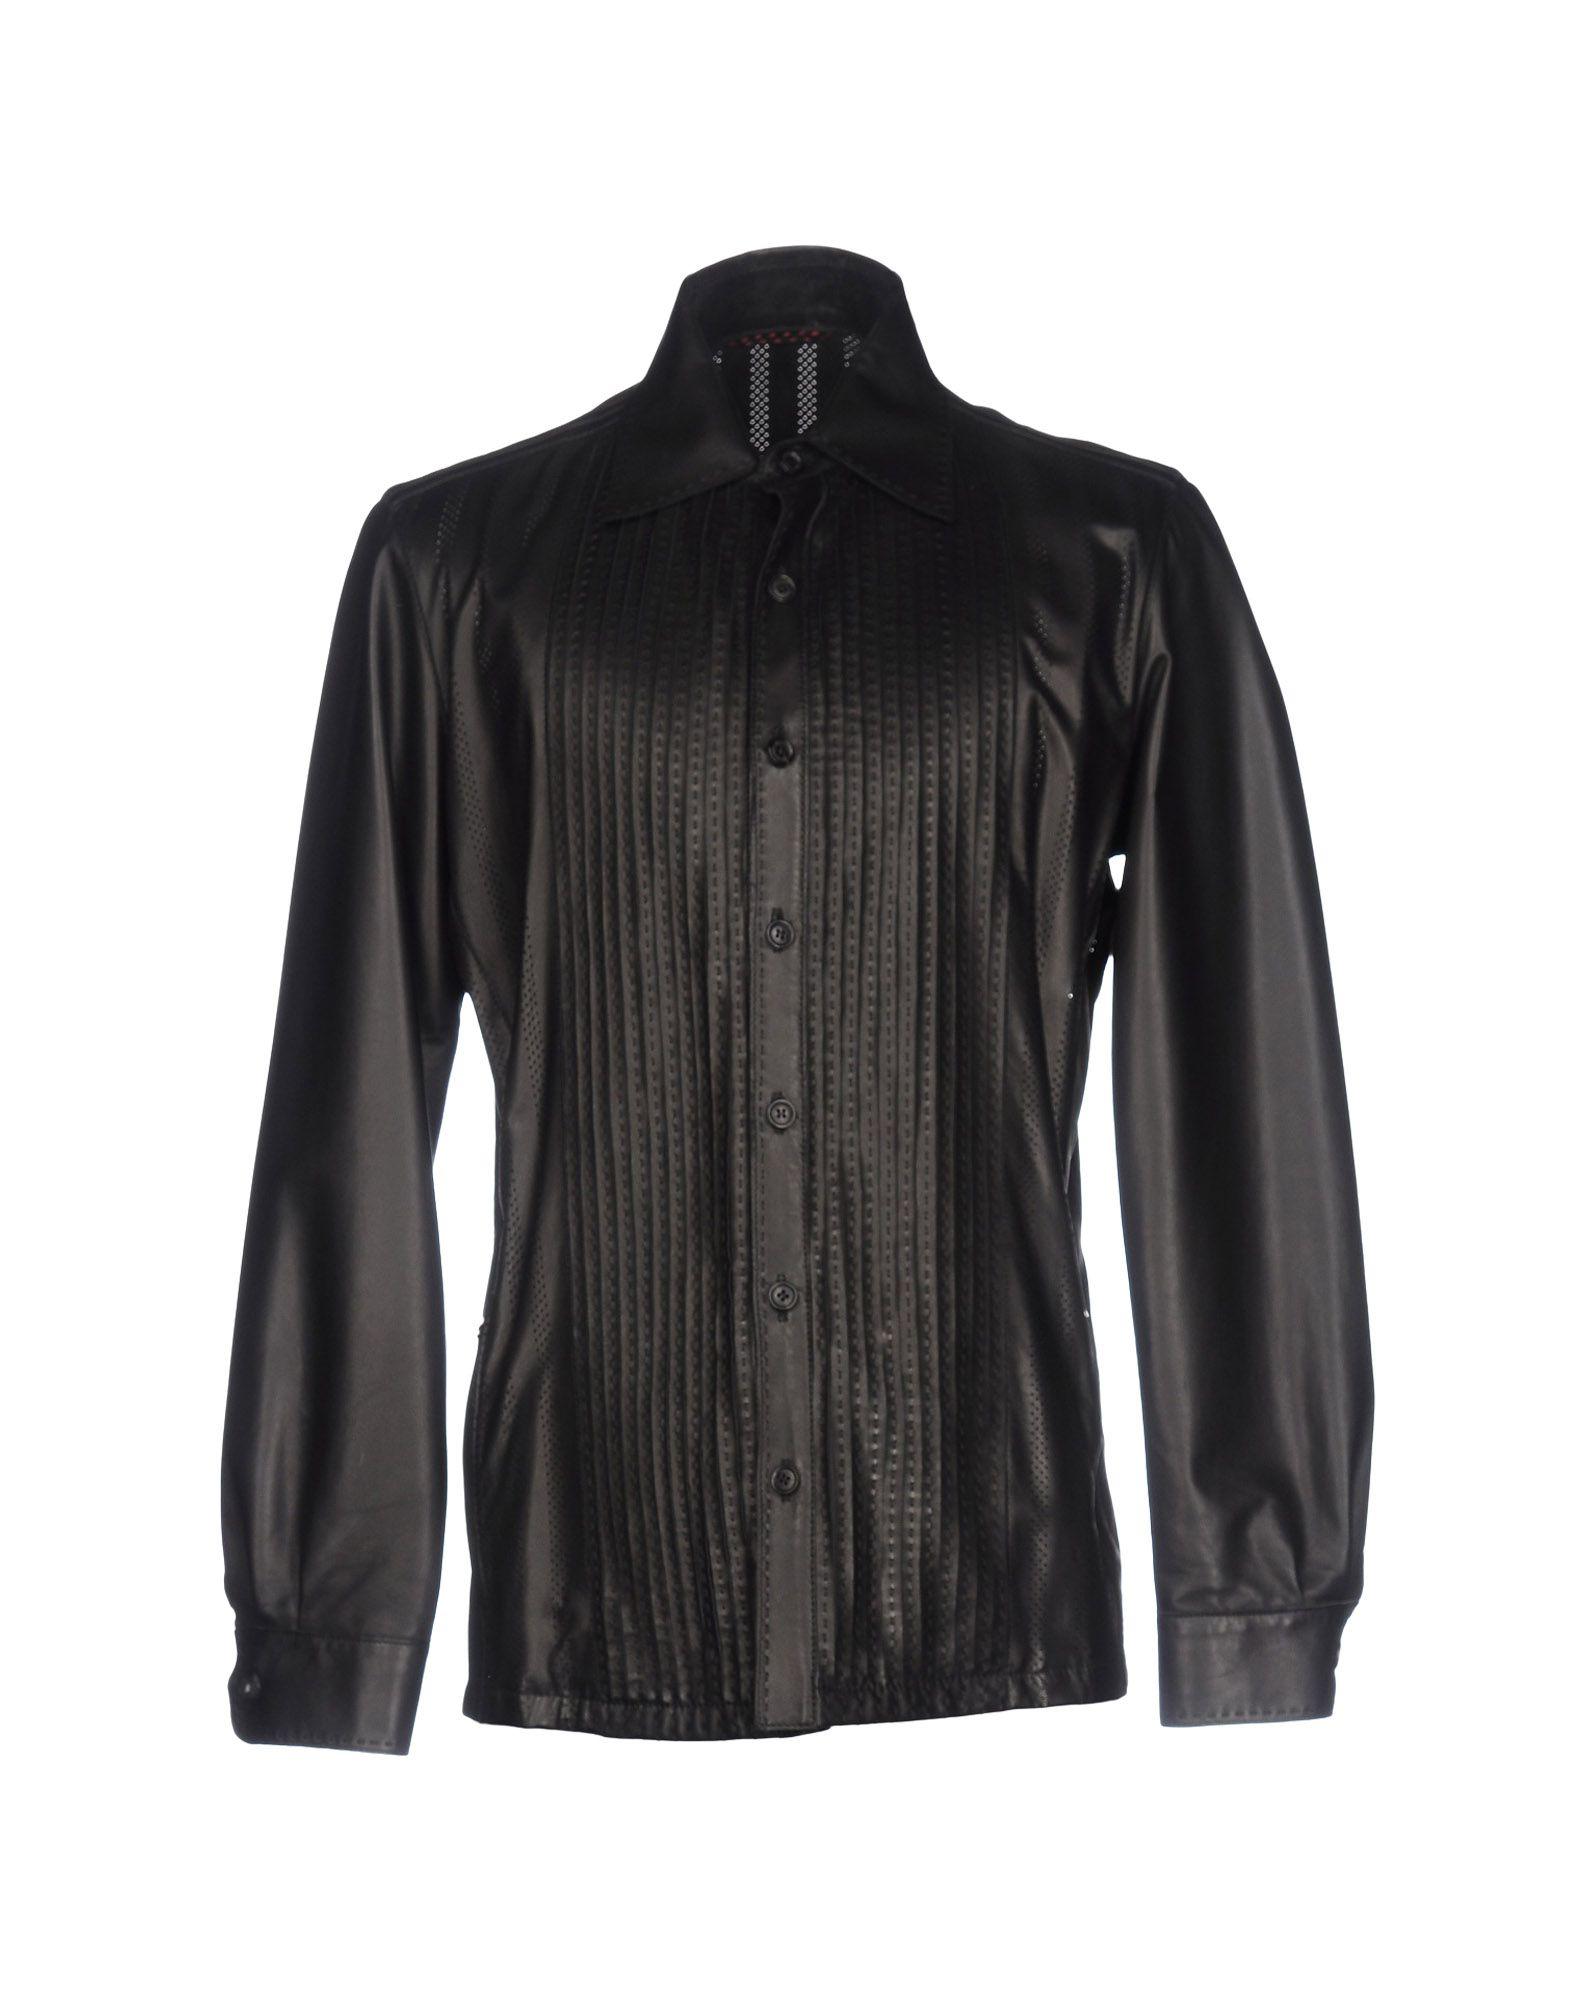 KAPRAUN Herren Hemd Farbe Schwarz Größe 8